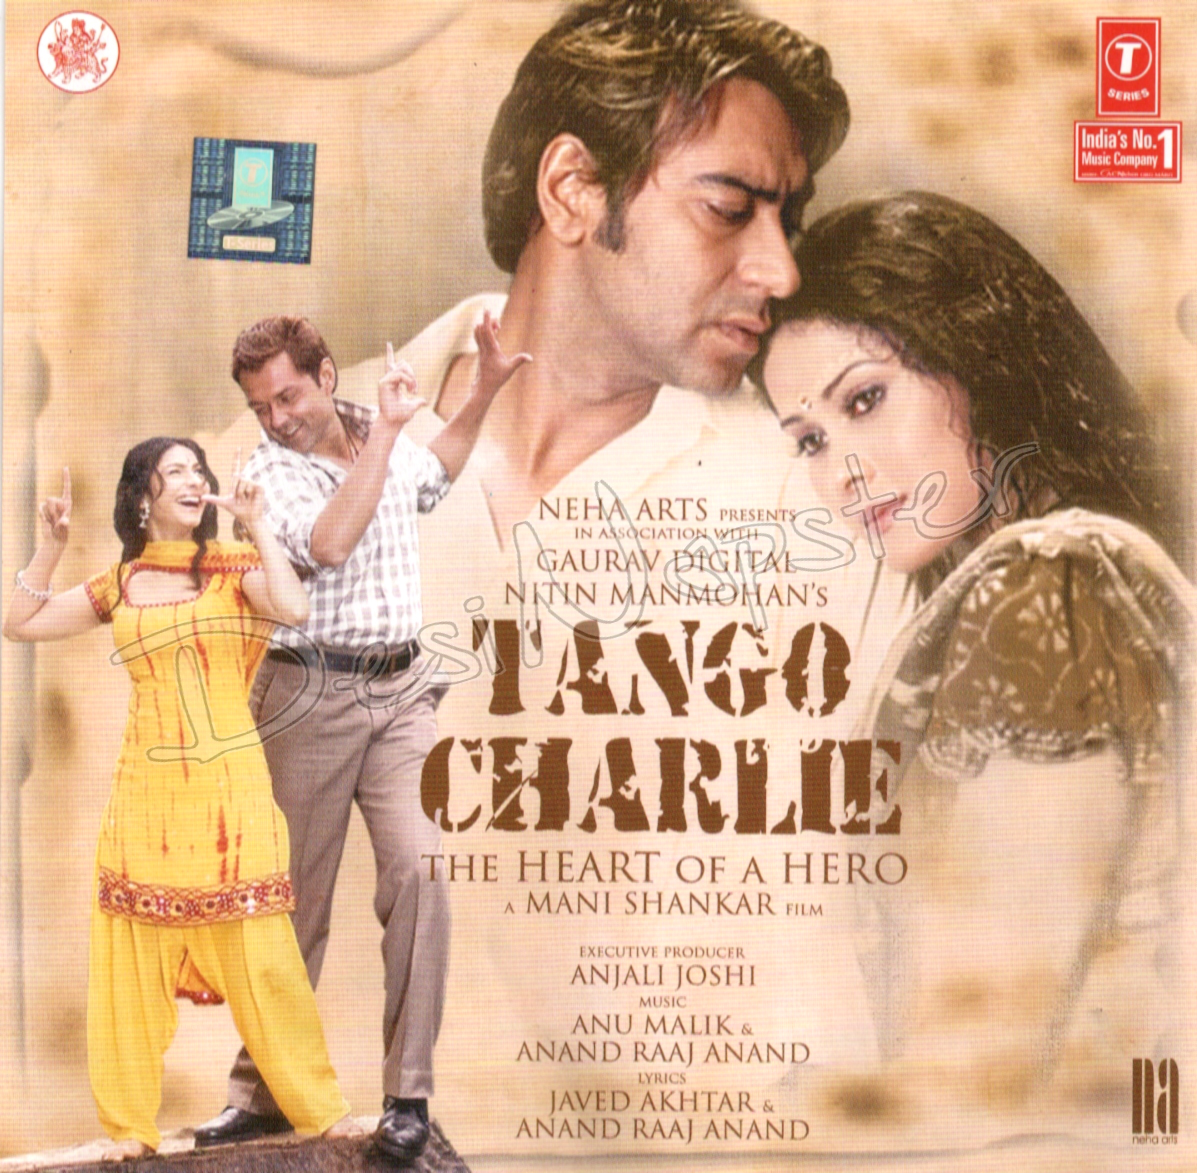 bait movie in hindi download